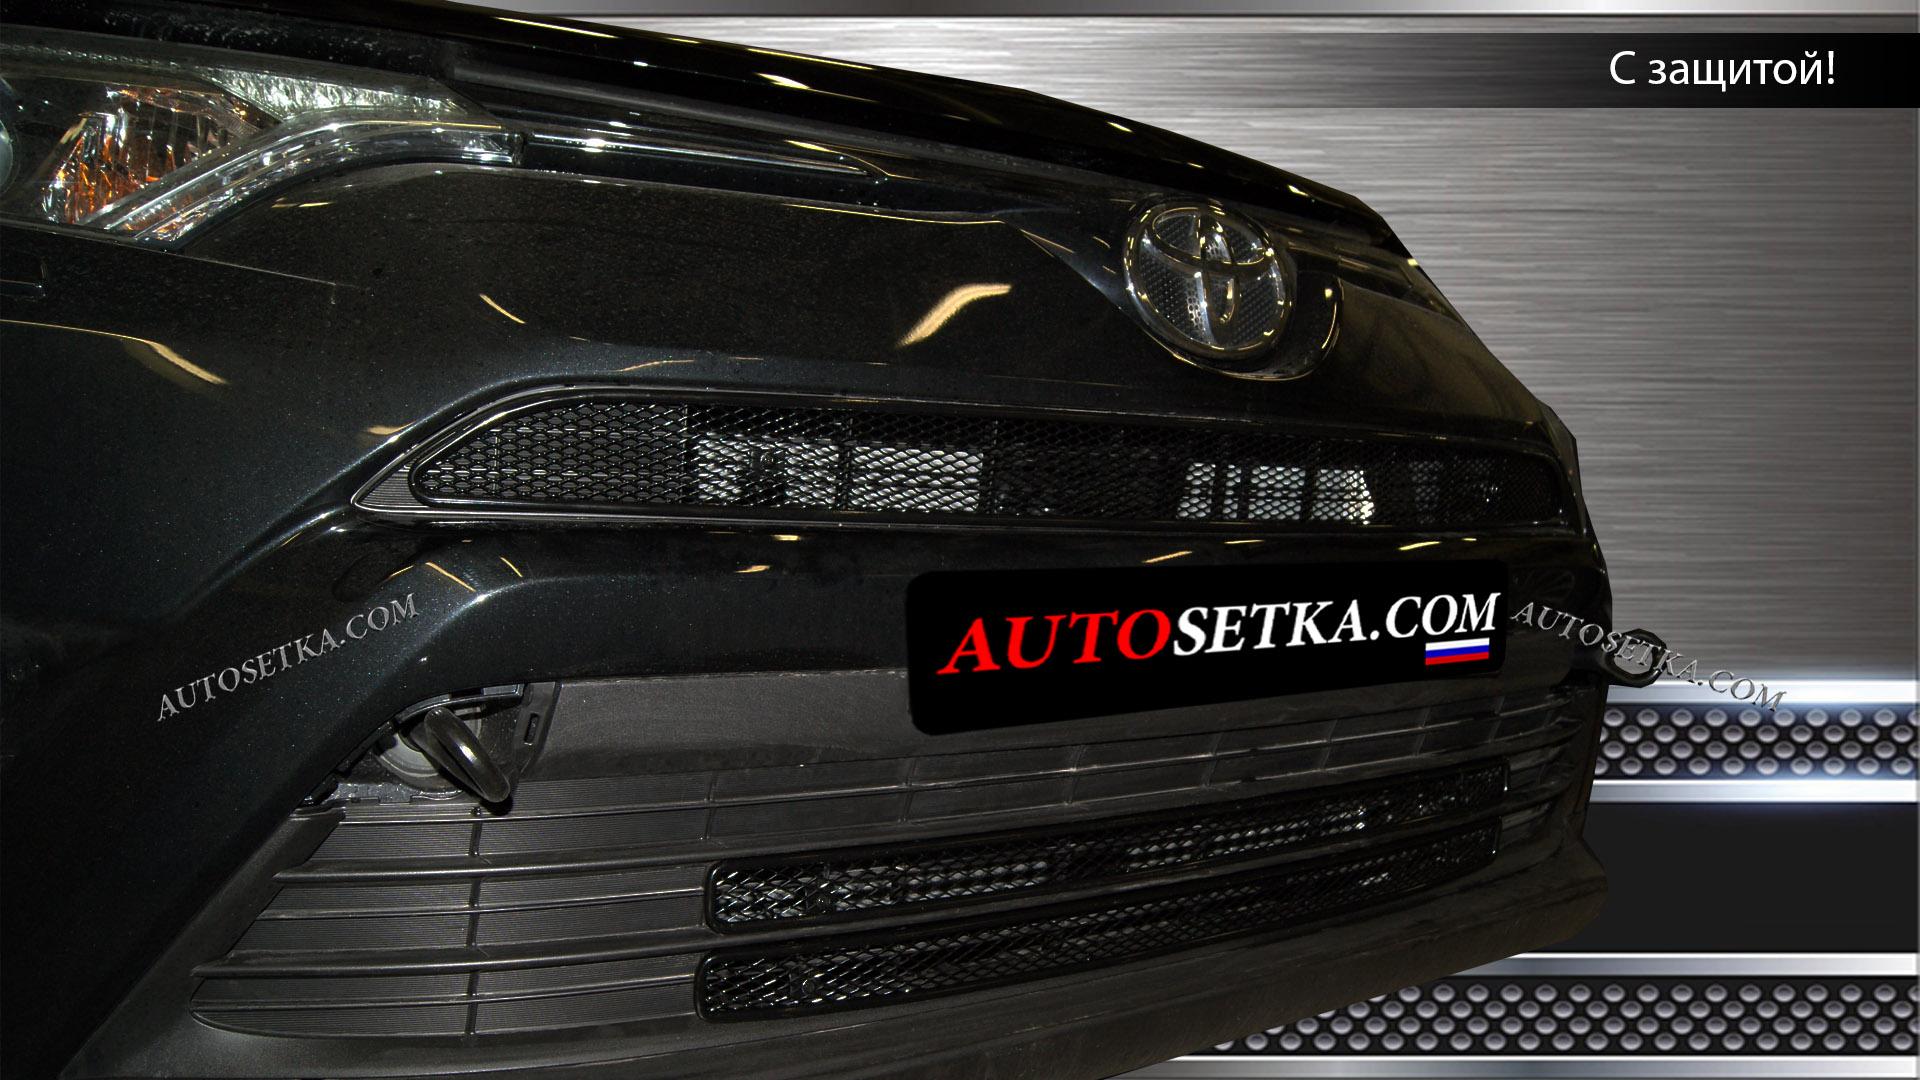 Toyota Rav 4 2015 (без камеры)